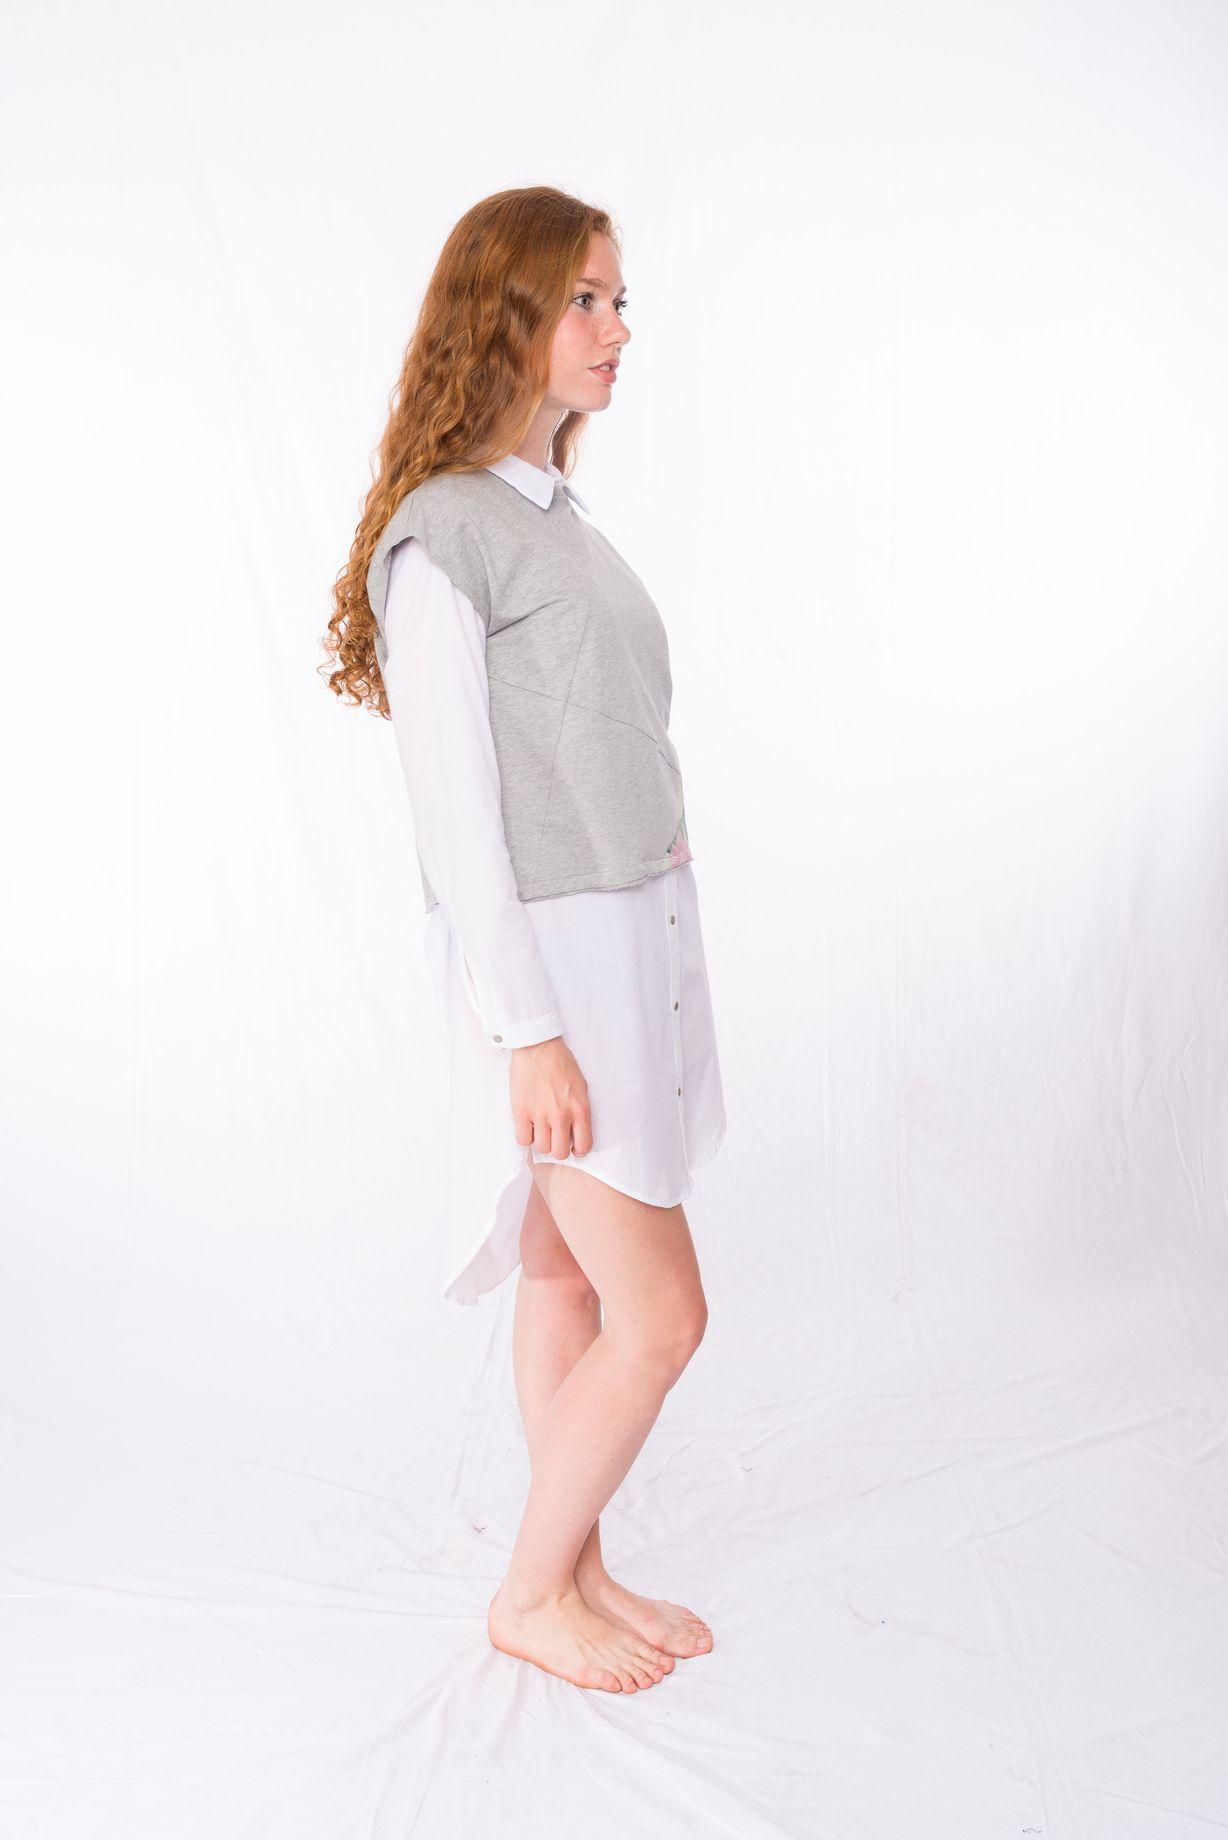 Sweat-Tshirt Shorty Tropic _ Bluse Vacama